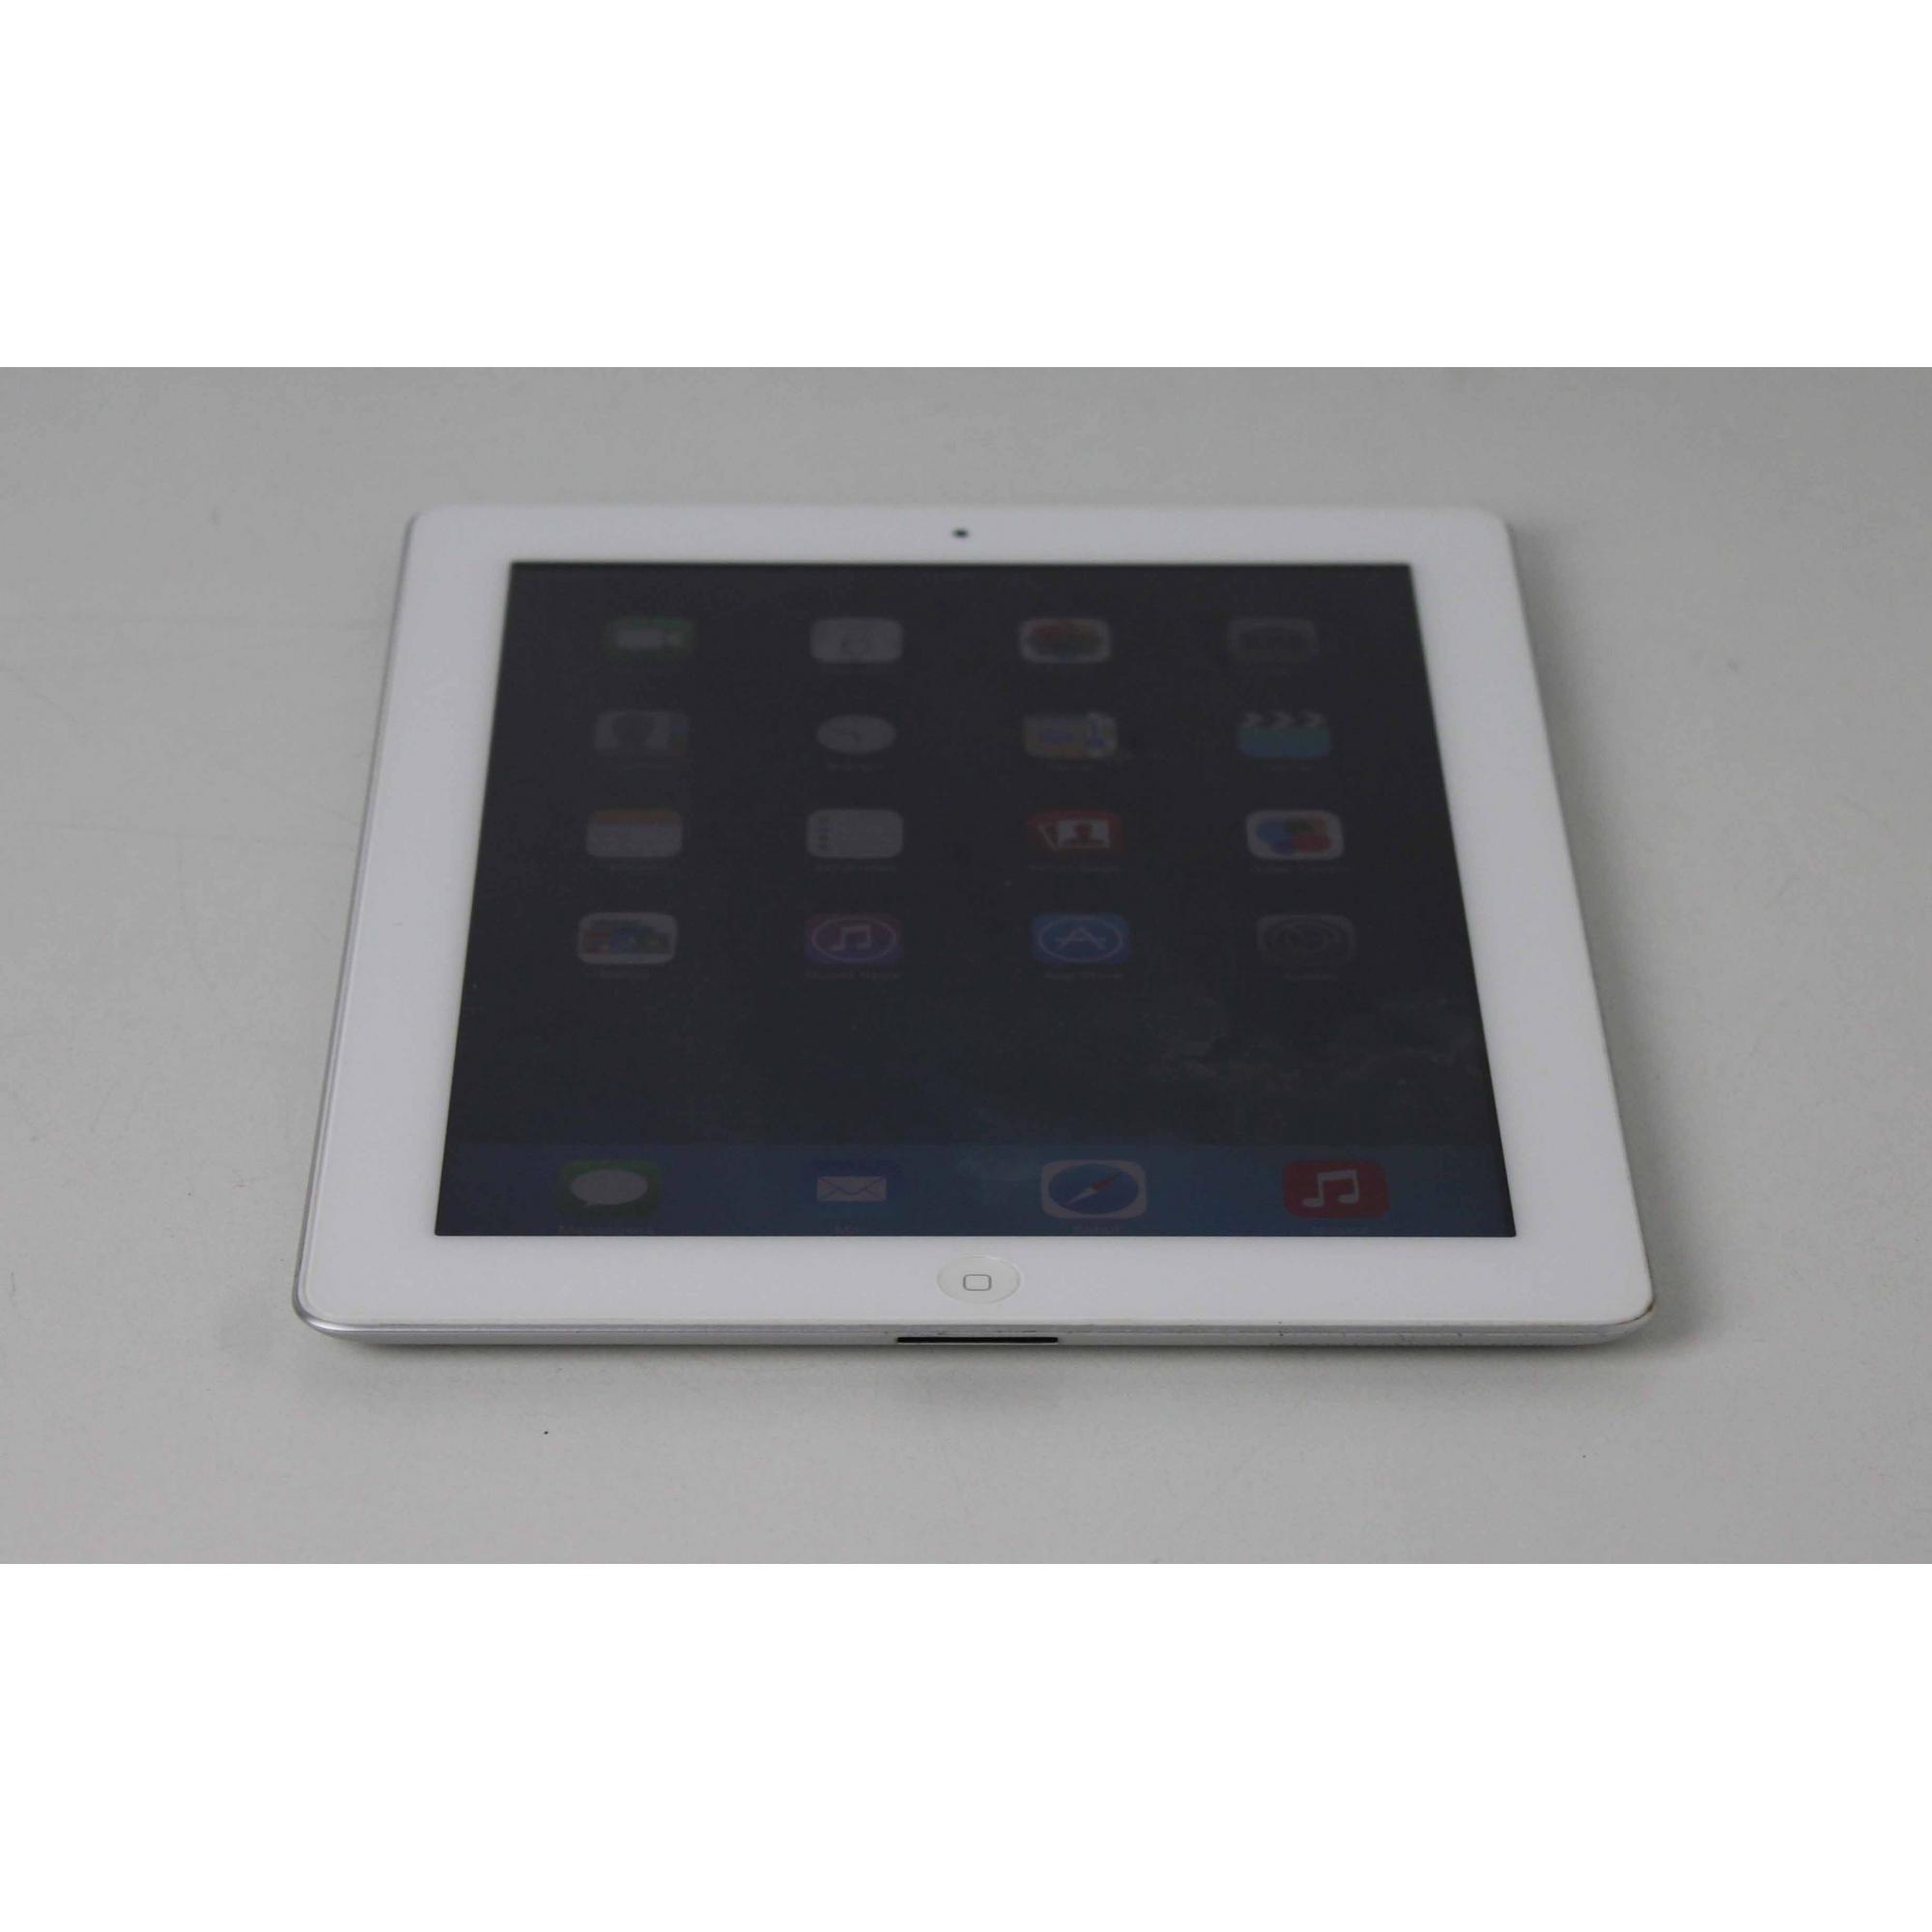 "iPad 2 MC984BZ/A 9.7"" 64GB Wifi + 3G - Silver"